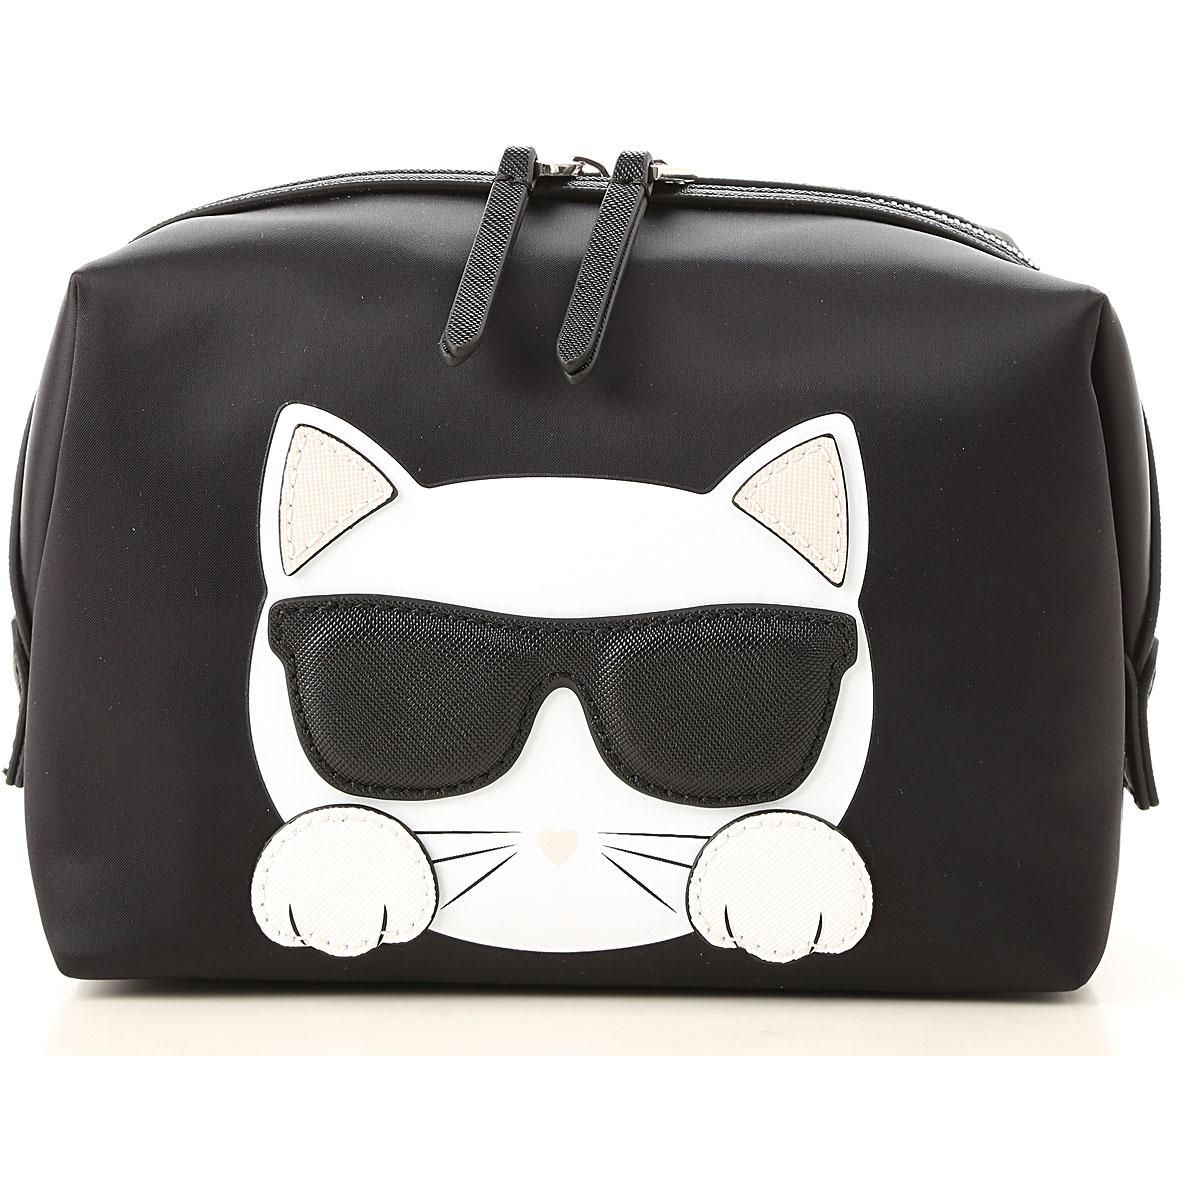 Image of Karl Lagerfeld Makeup Bag Cosmetic Case for Women, Black, Nylon, 2017